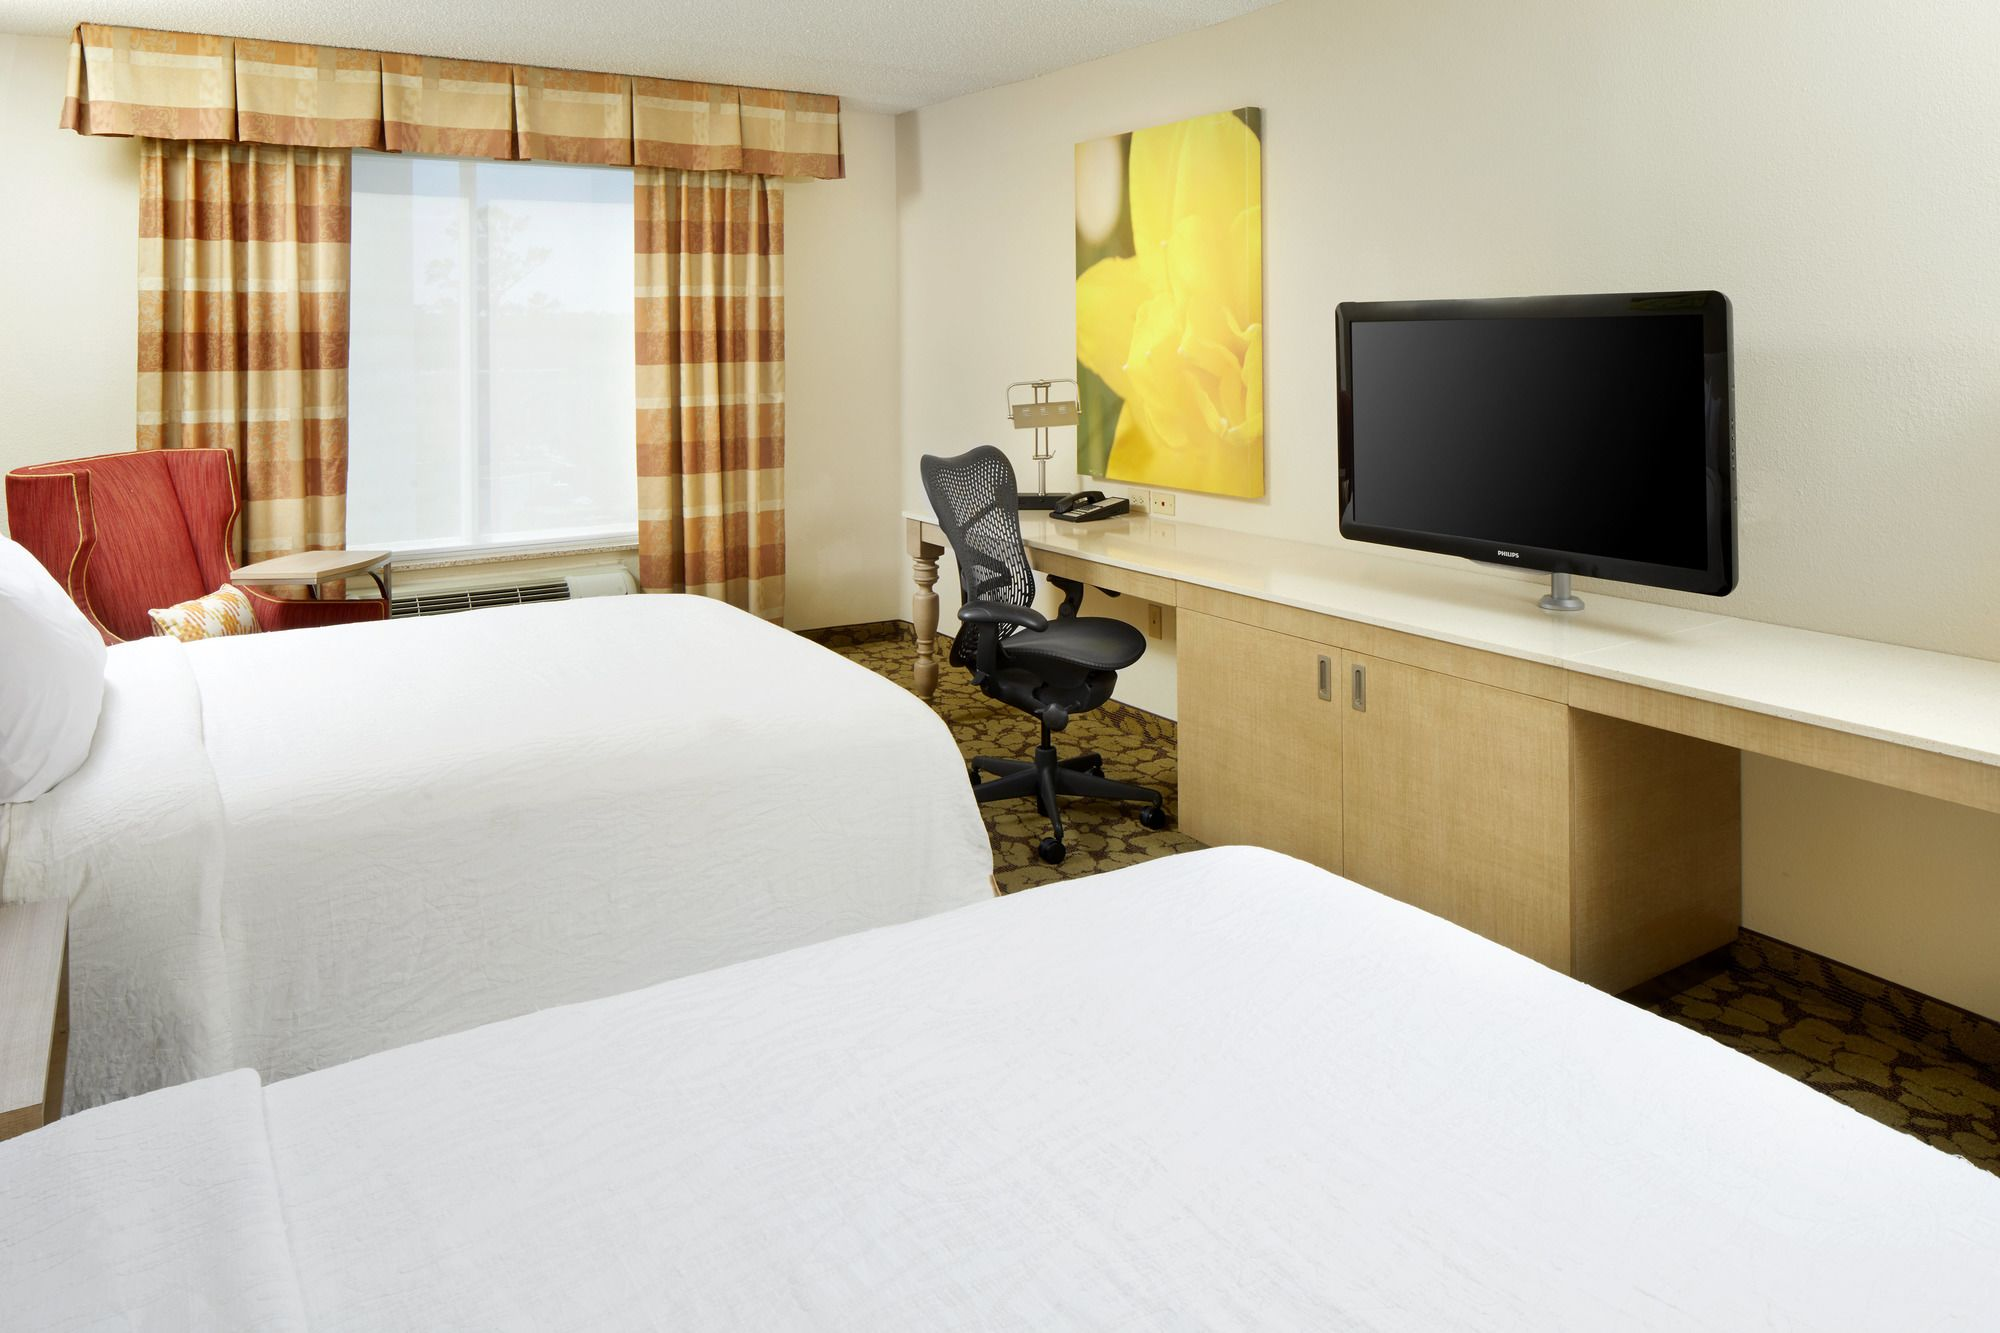 Hilton Garden Inn Savannah Midtown in Savannah, GA